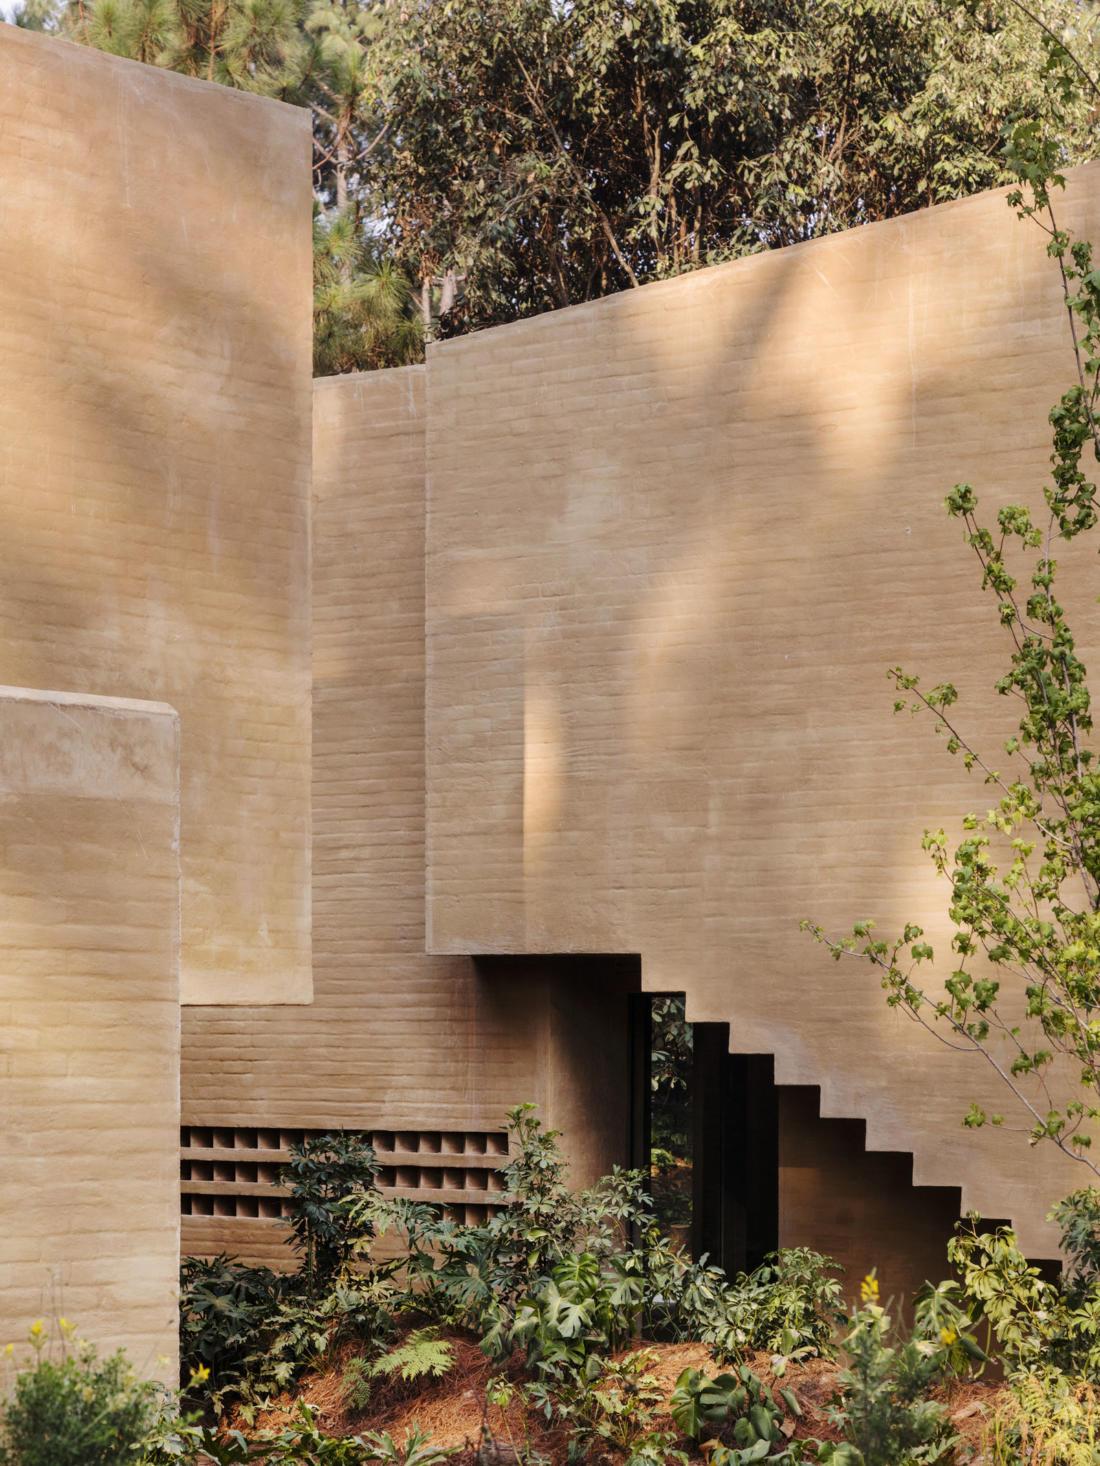 Проект таунхауса в Мексике от Taller Hector Barroso 17